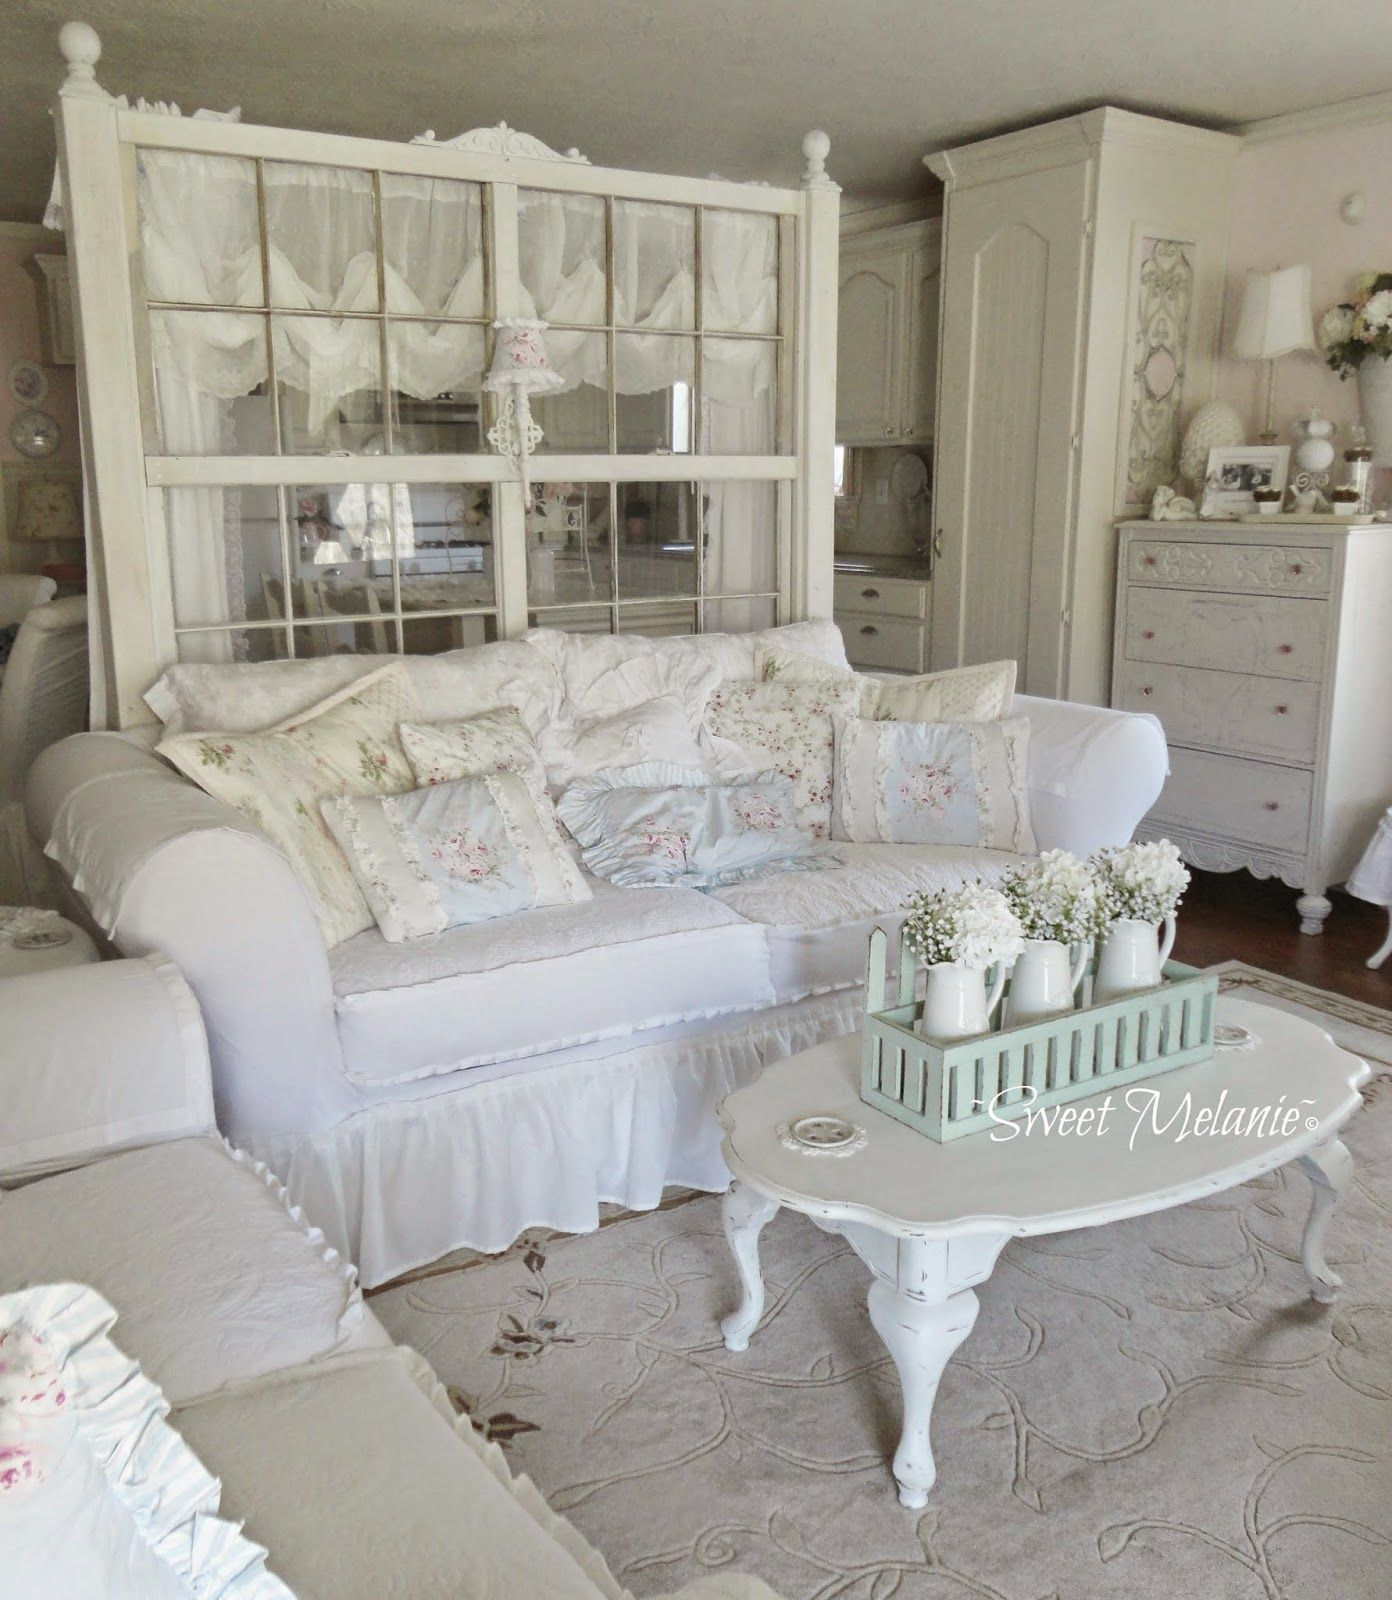 March 2015 Shabby Chic Decor Living Room Shabby Chic Living Shabby Chic Living Room #rustic #chic #decor #living #room